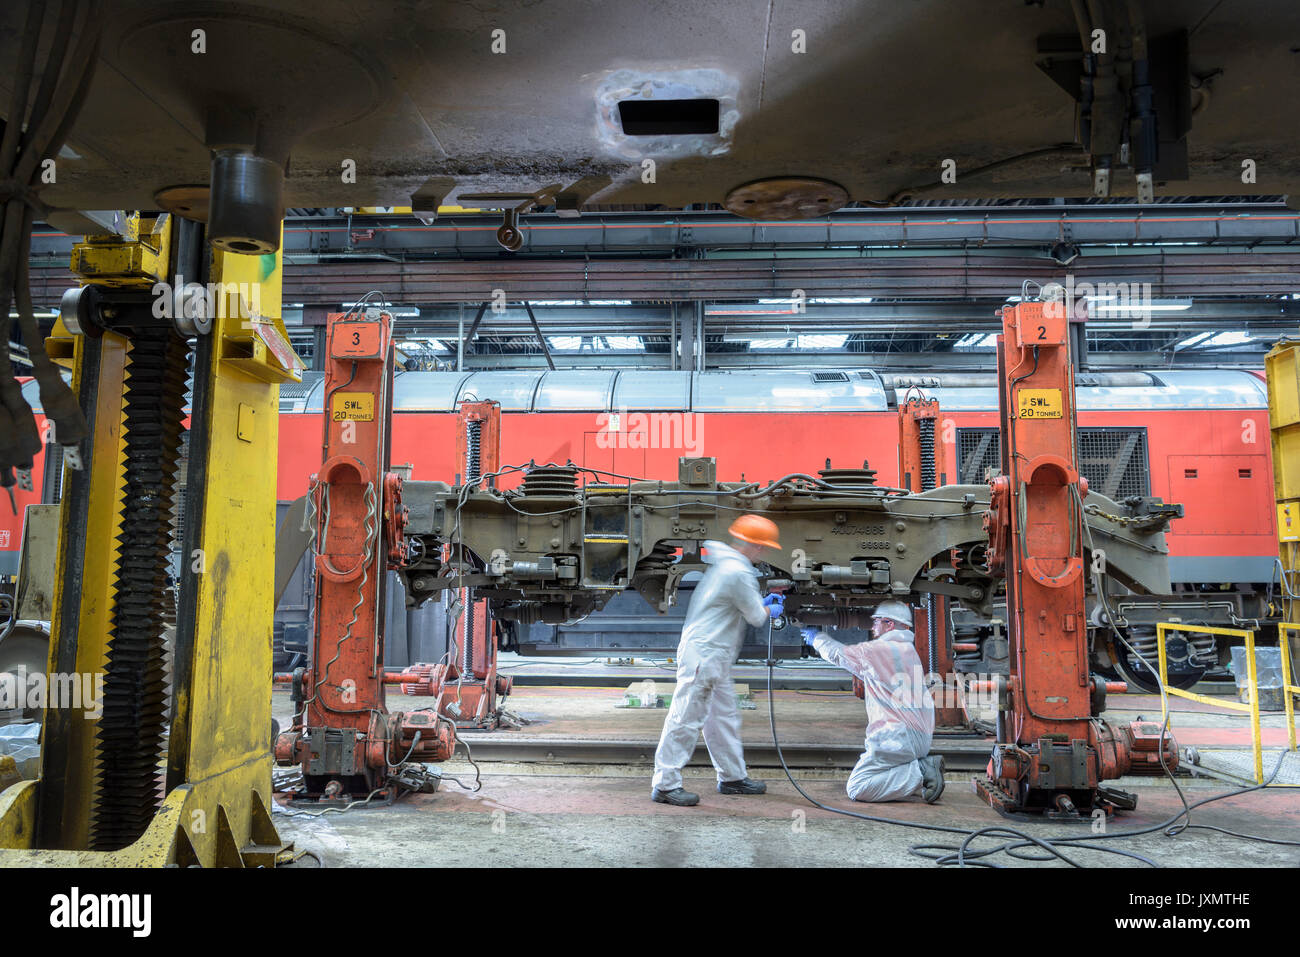 Locomotive engineers working on locomotive in train works - Stock Image